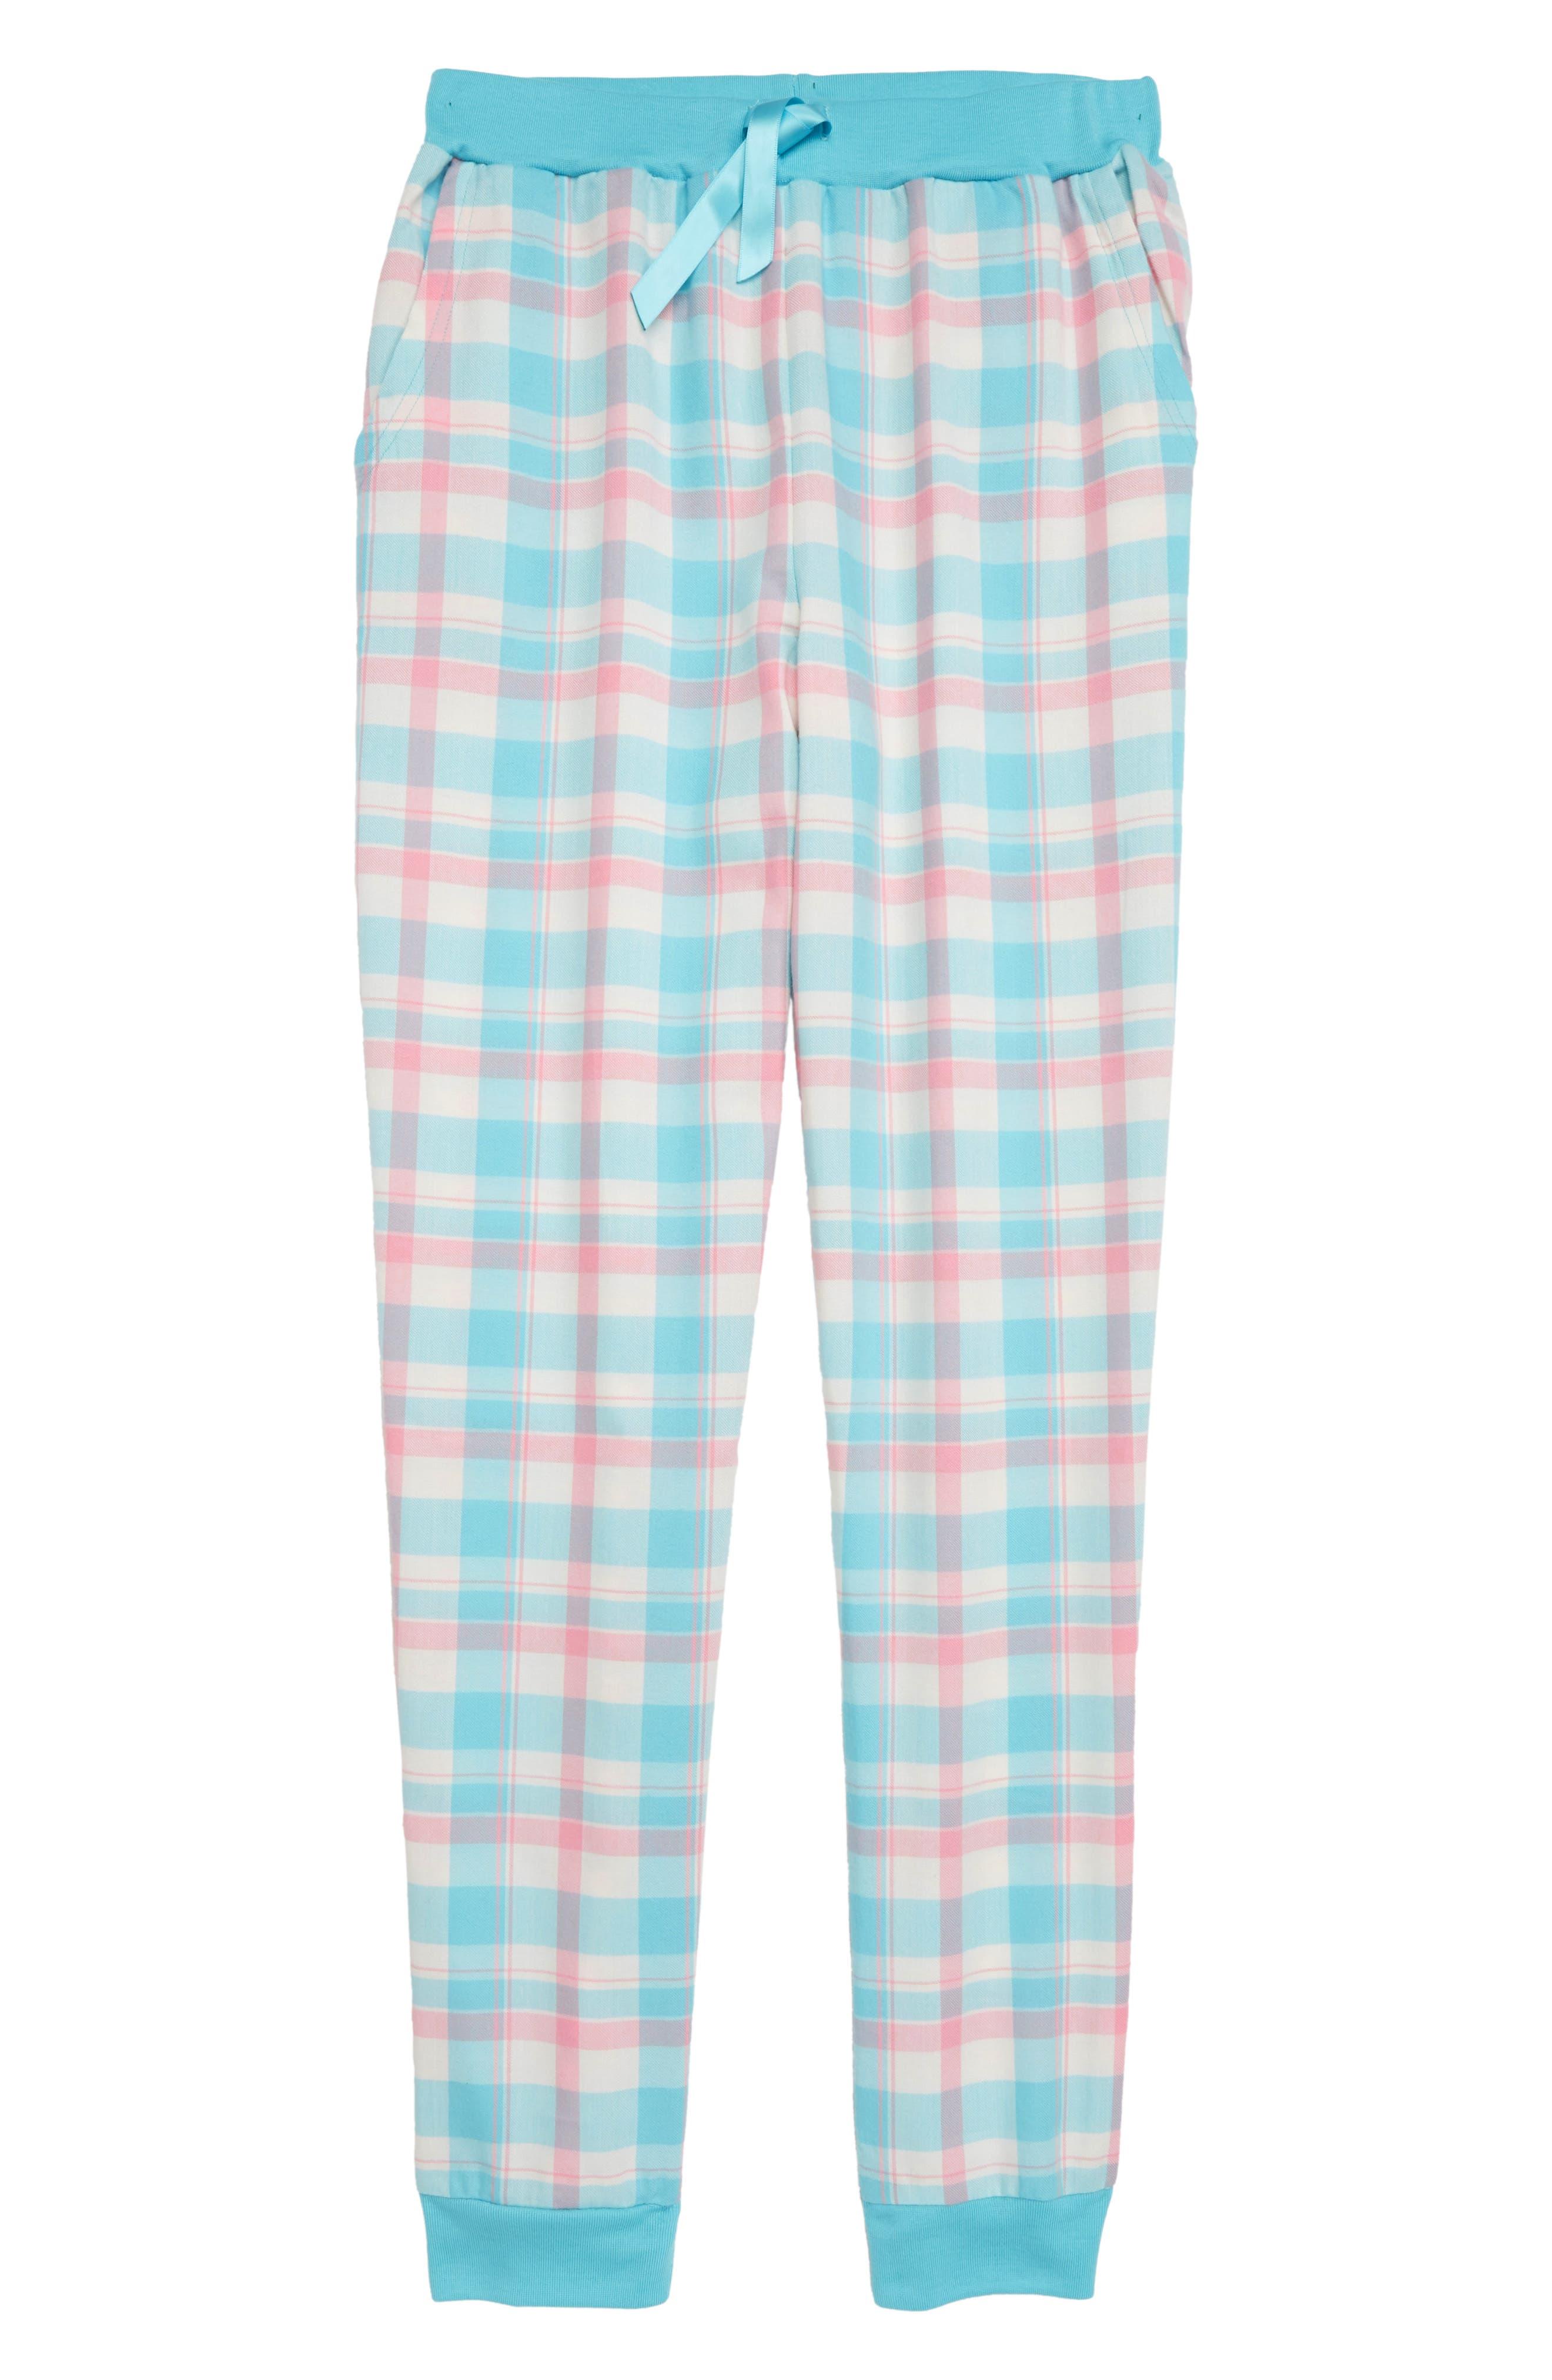 Flannel Pajama Pants,                         Main,                         color, 440